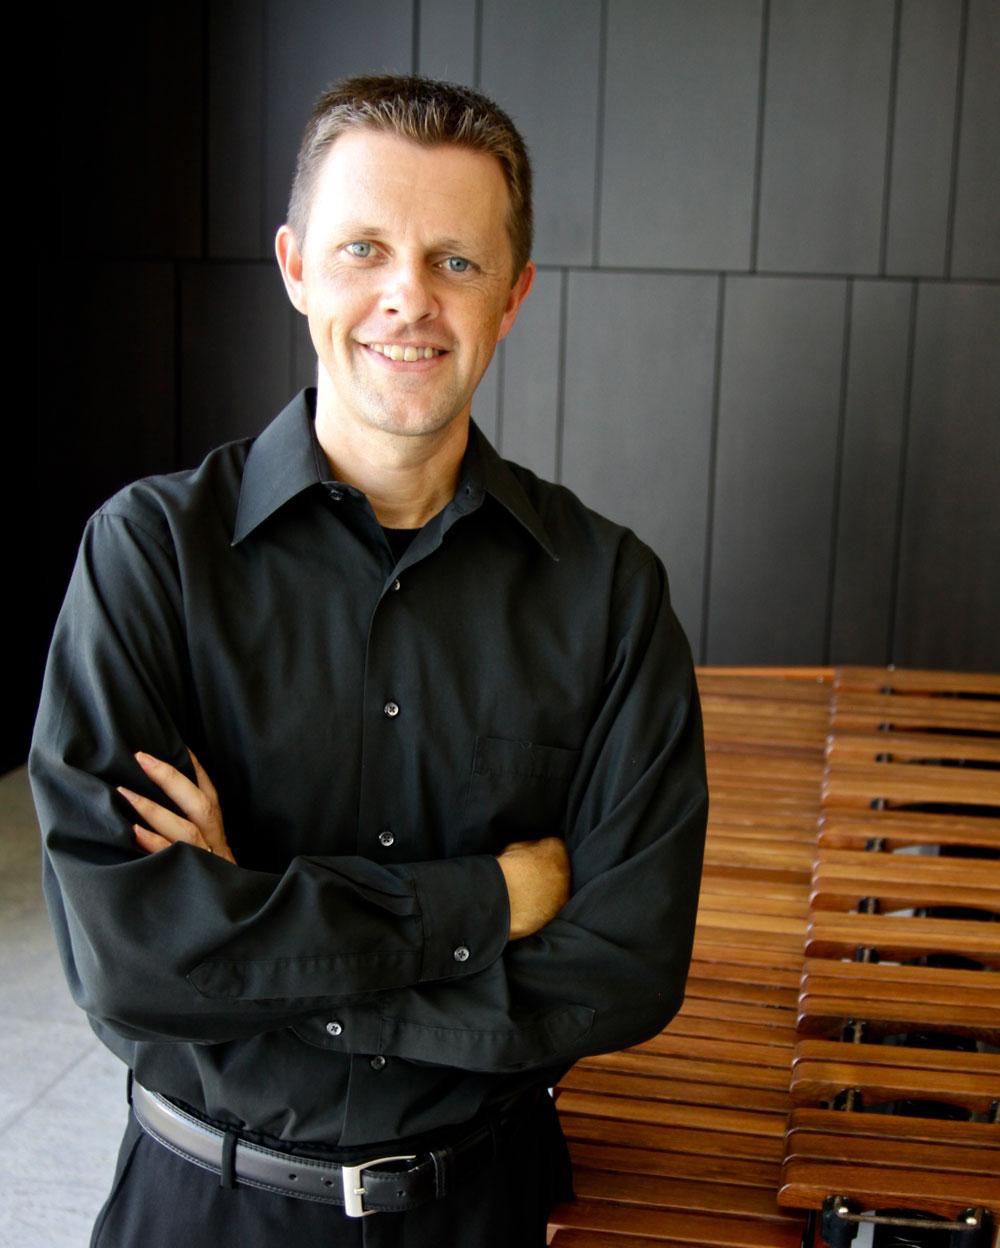 Brian Zator